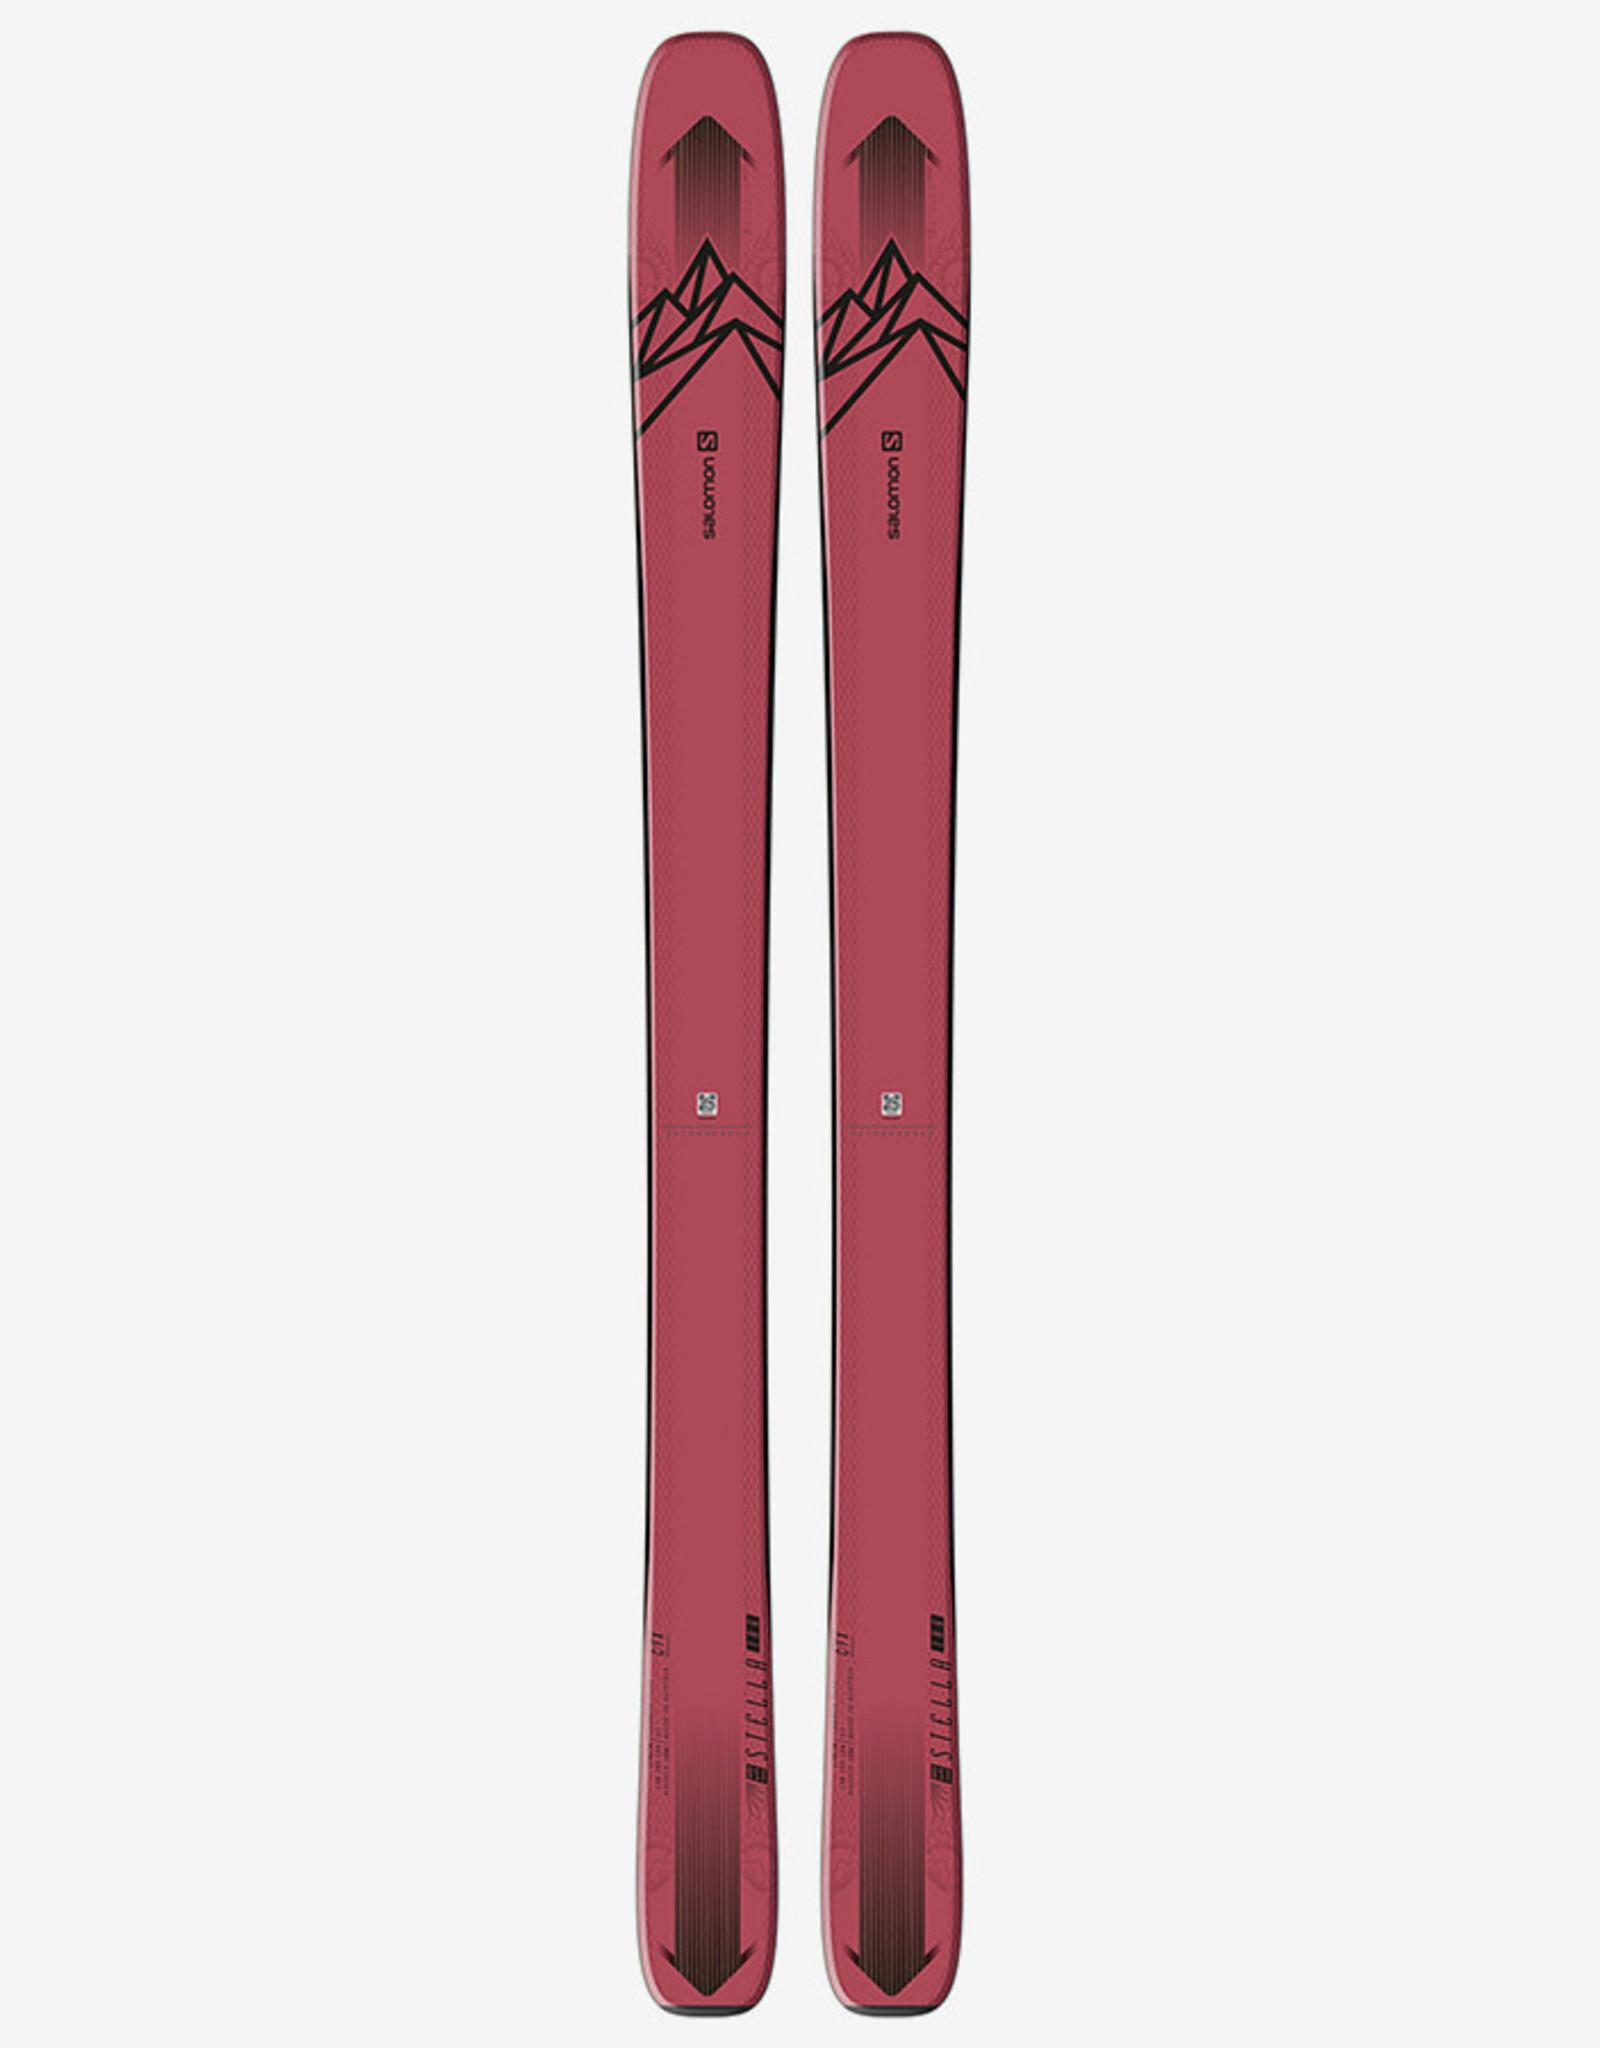 Salomon SALOMON Skis QST STELLA 106 (19/20)